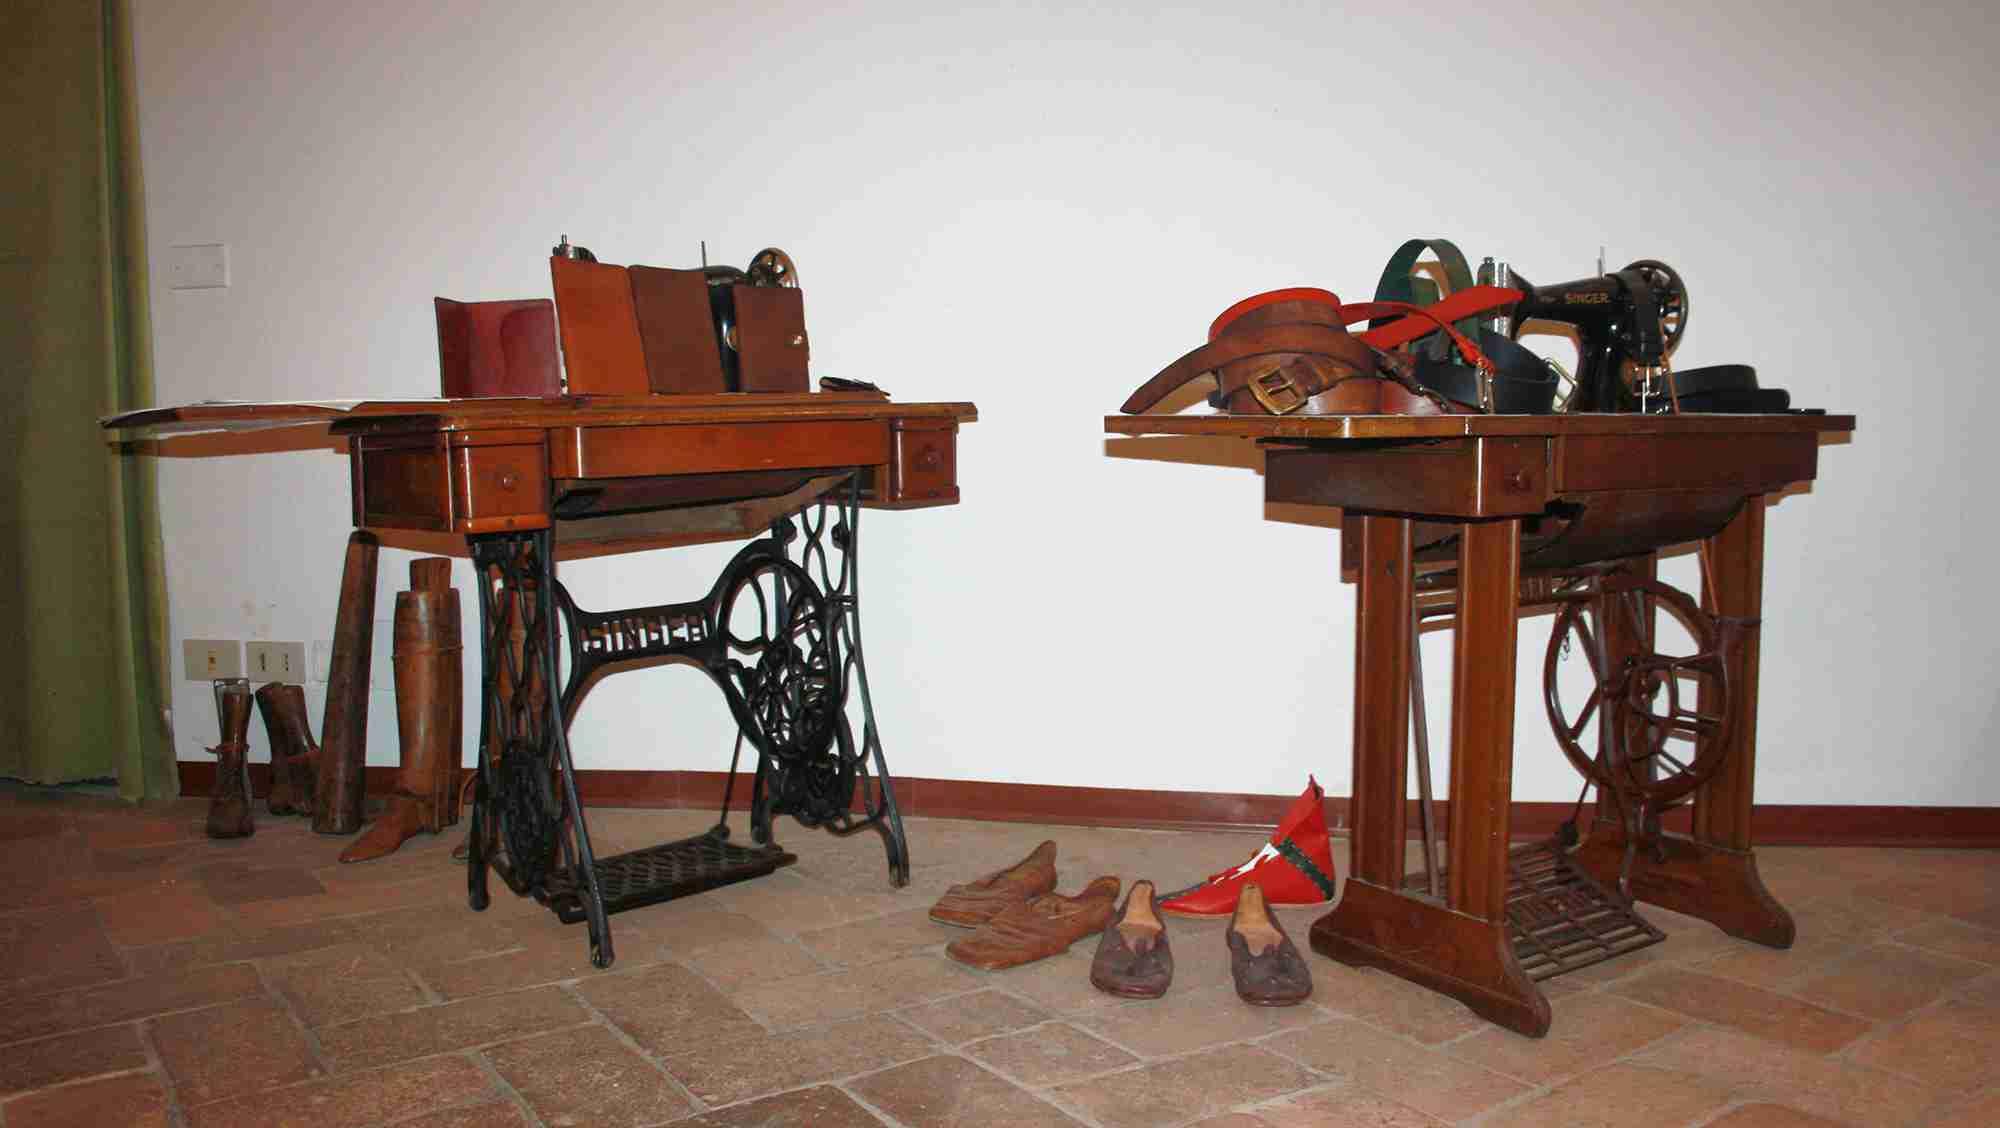 Laboratorio artigiano dei calzaioli